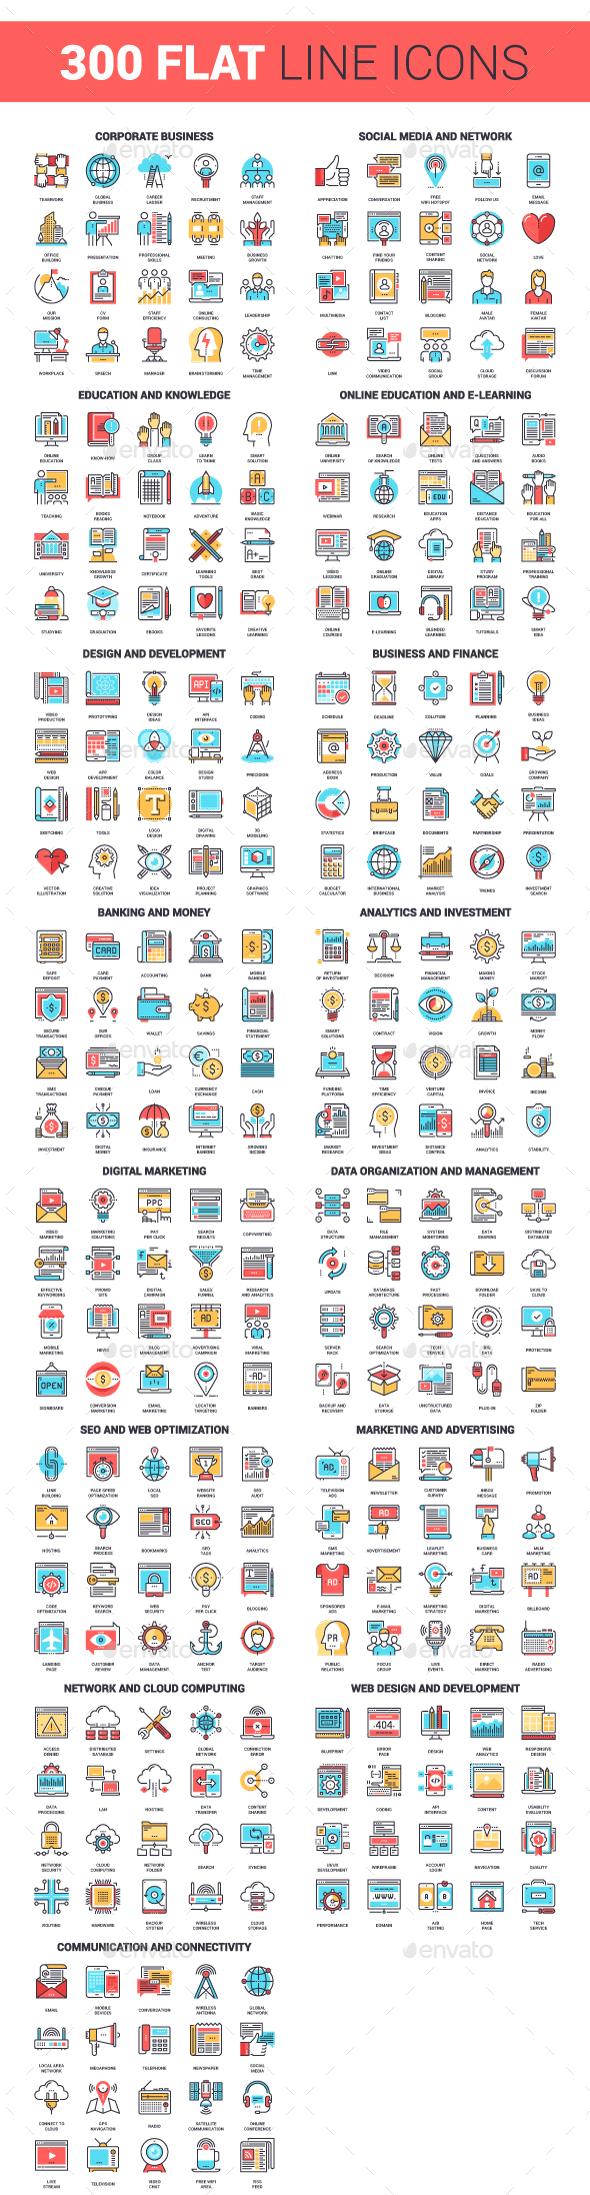 300 Flat Line Icons Bundle